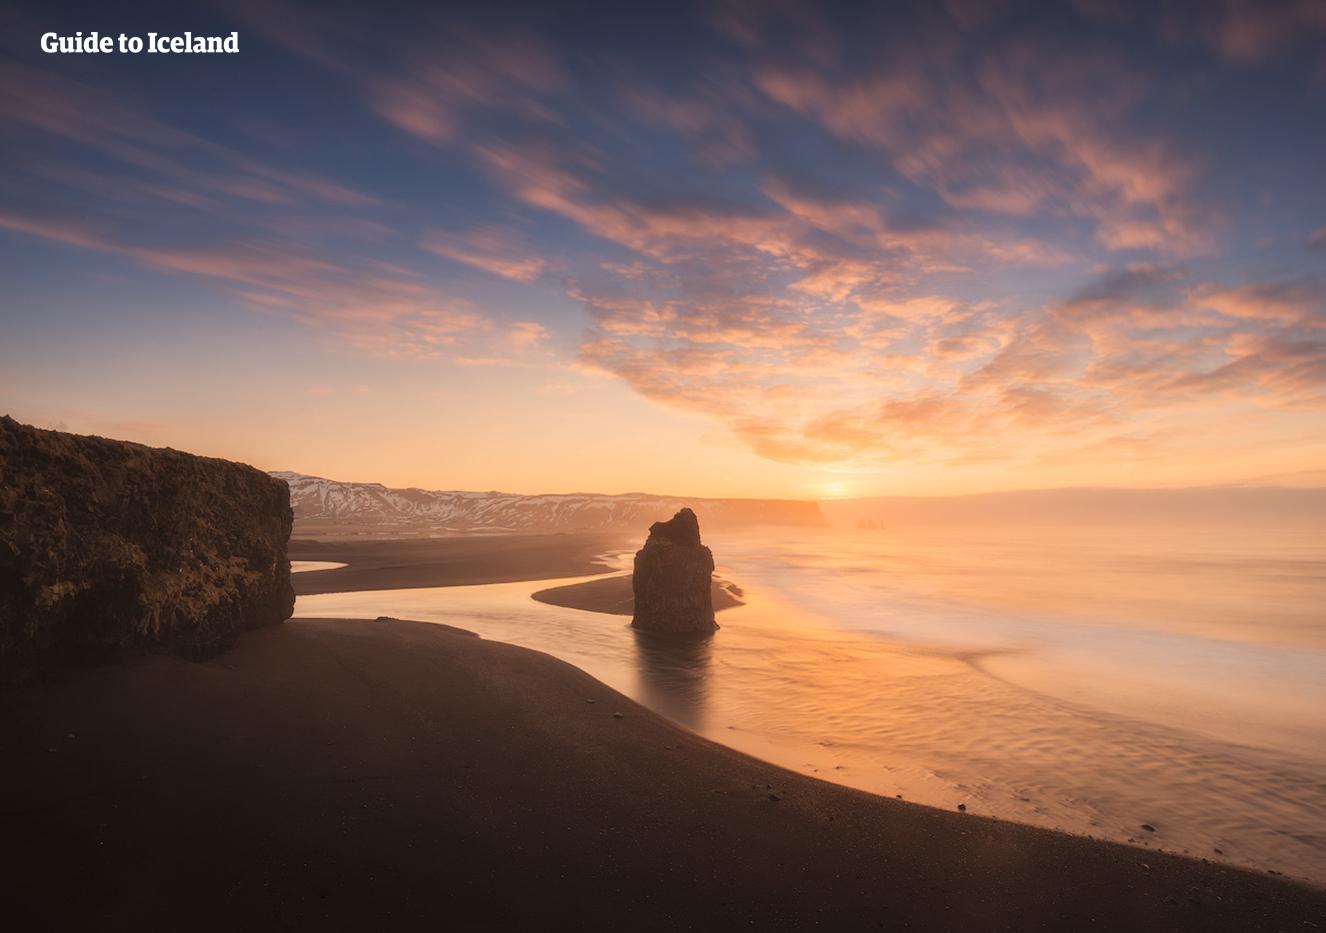 Автотур «Игра престолов» | Исландия за 10 дней - day 3